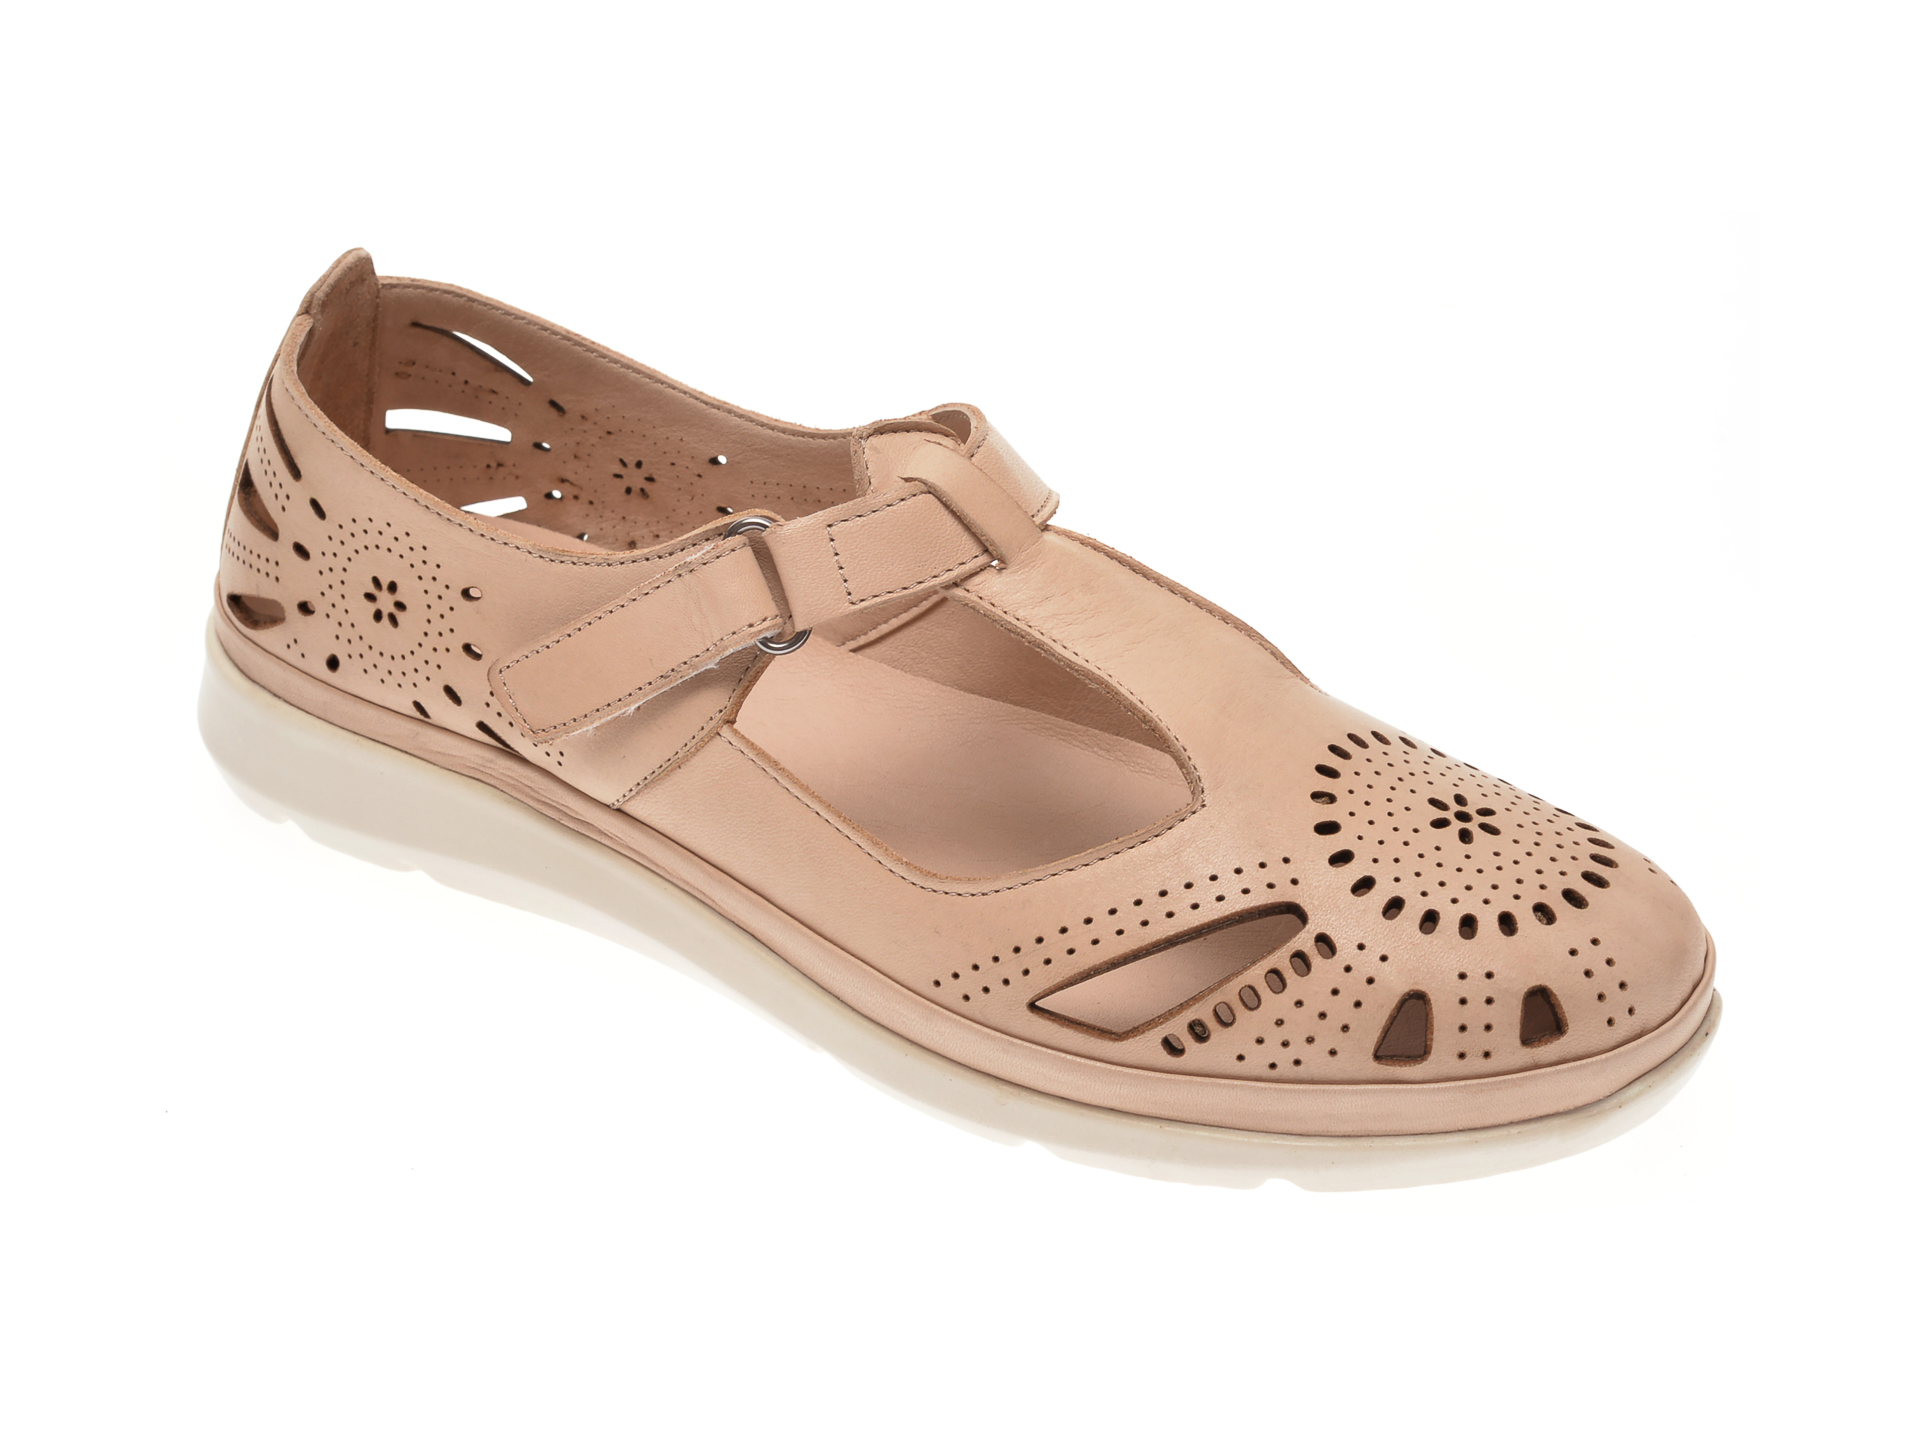 Pantofi MARCHA bej, 602, din piele naturala imagine